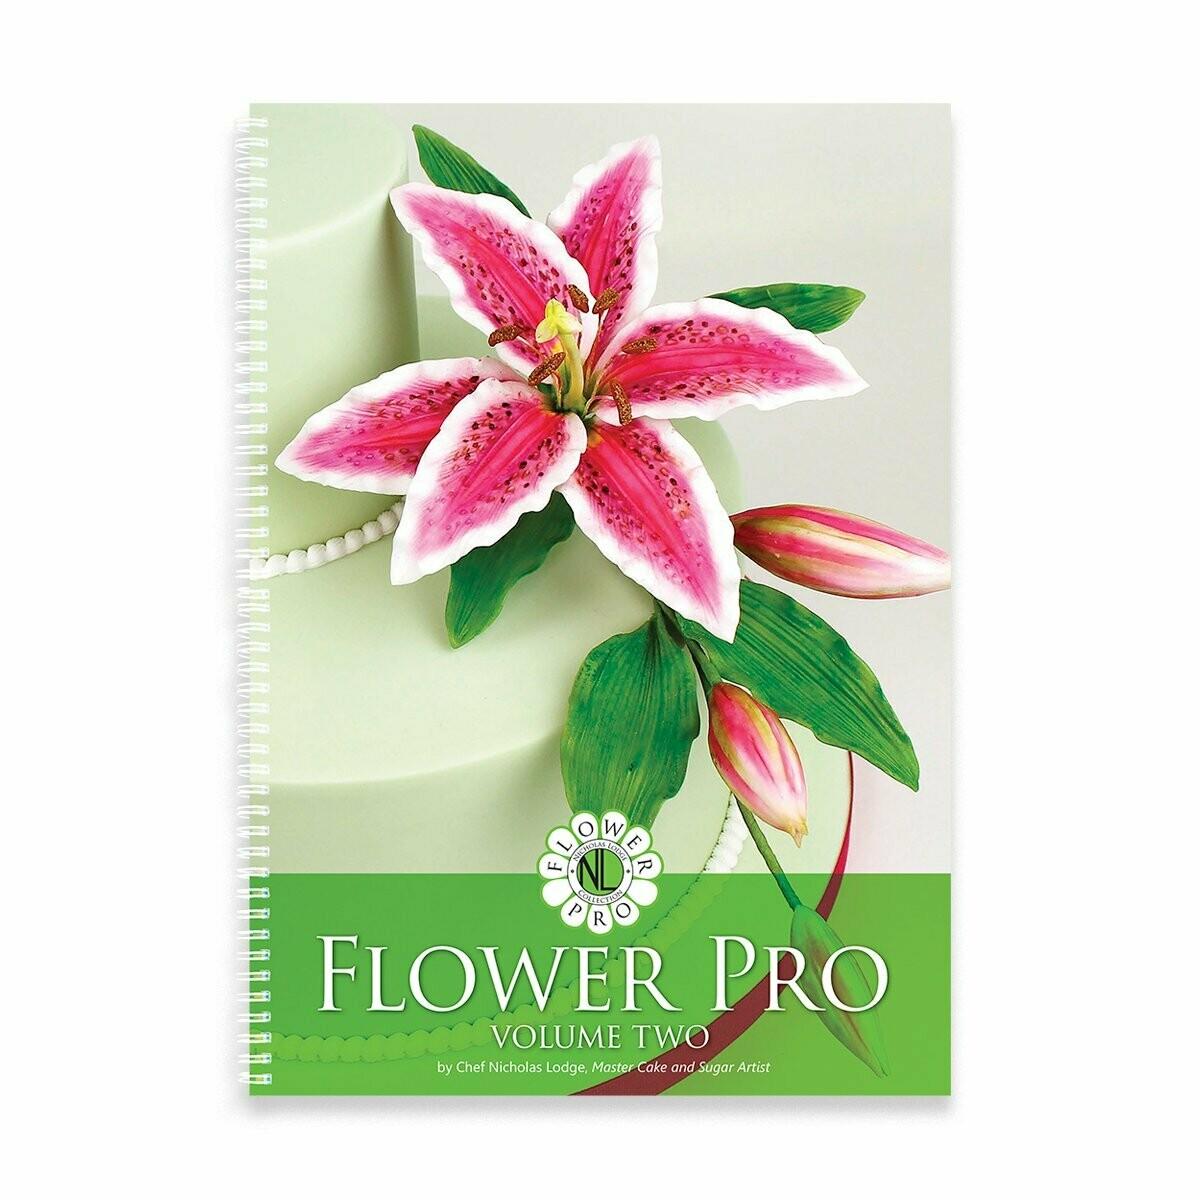 Flower Pro Collection Book Vol. 2 - Autographed by Nicholas Lodge